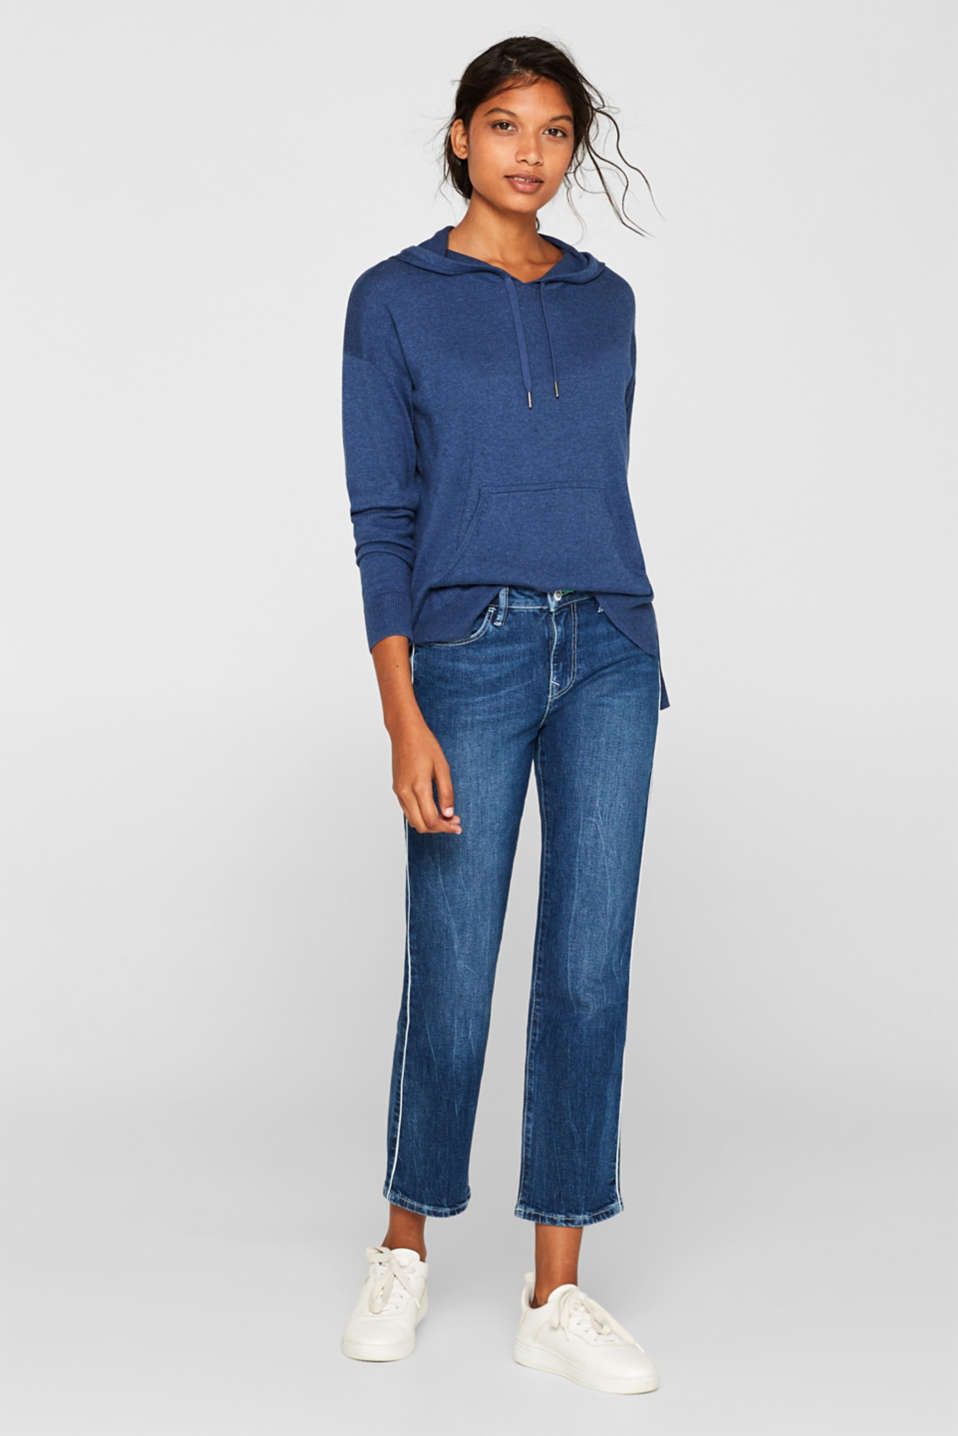 Sweaters, DARK BLUE 5, detail image number 1